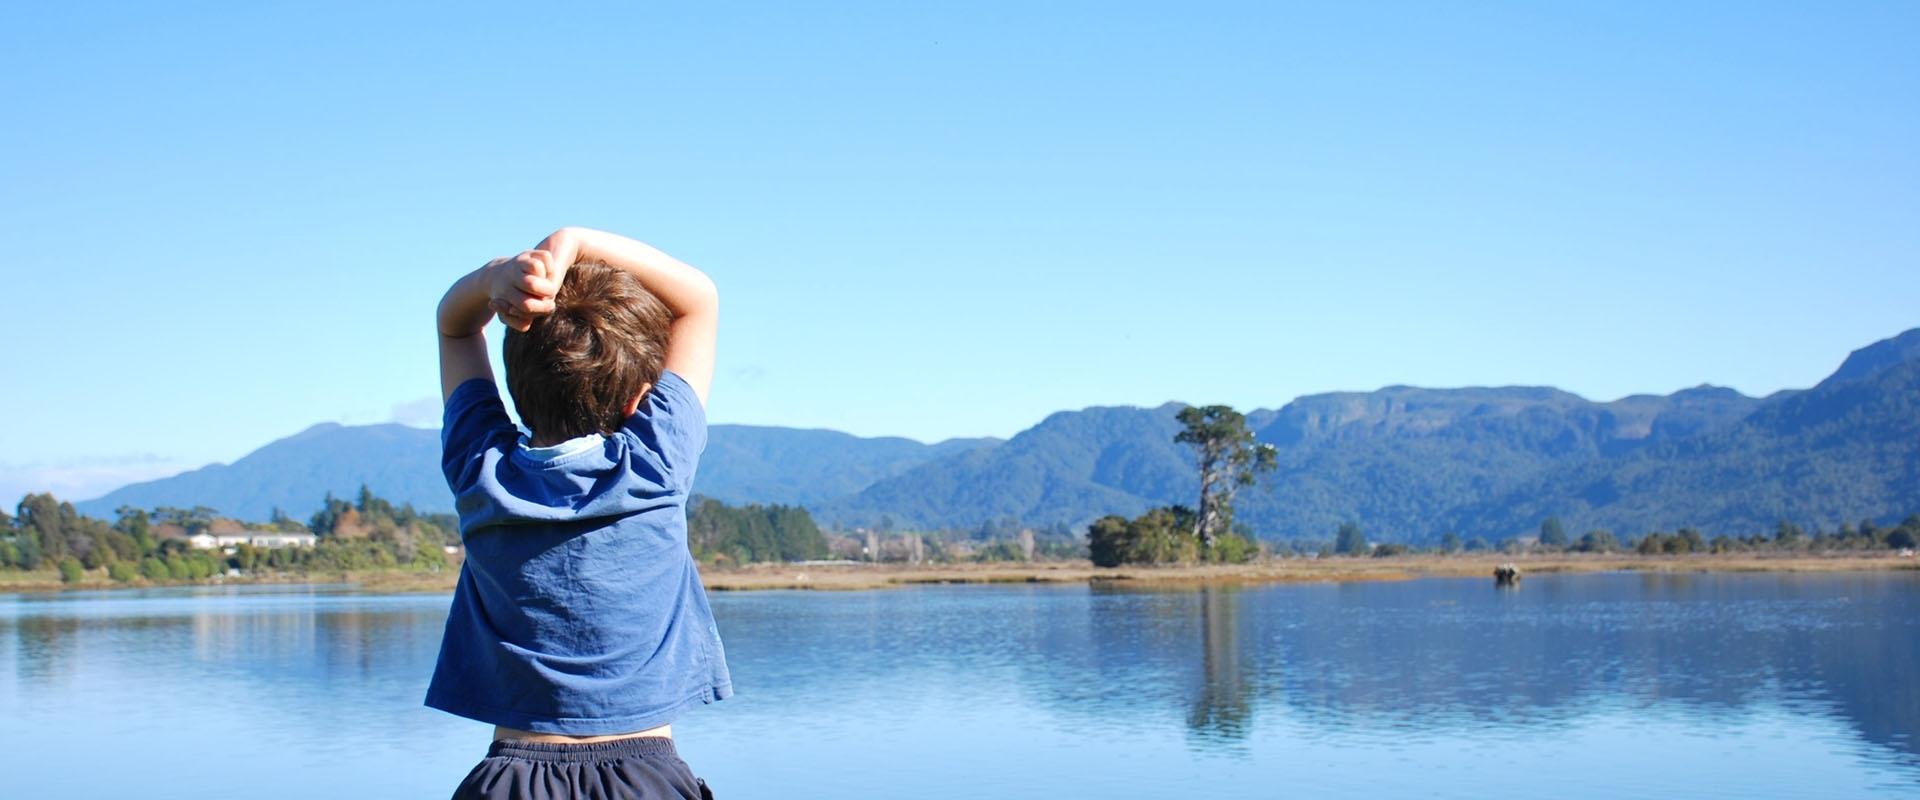 New Zealand School Holidays 2020 - Publicholidays.co.nz Exceptional 2020 Calendar Nz Public Holidays